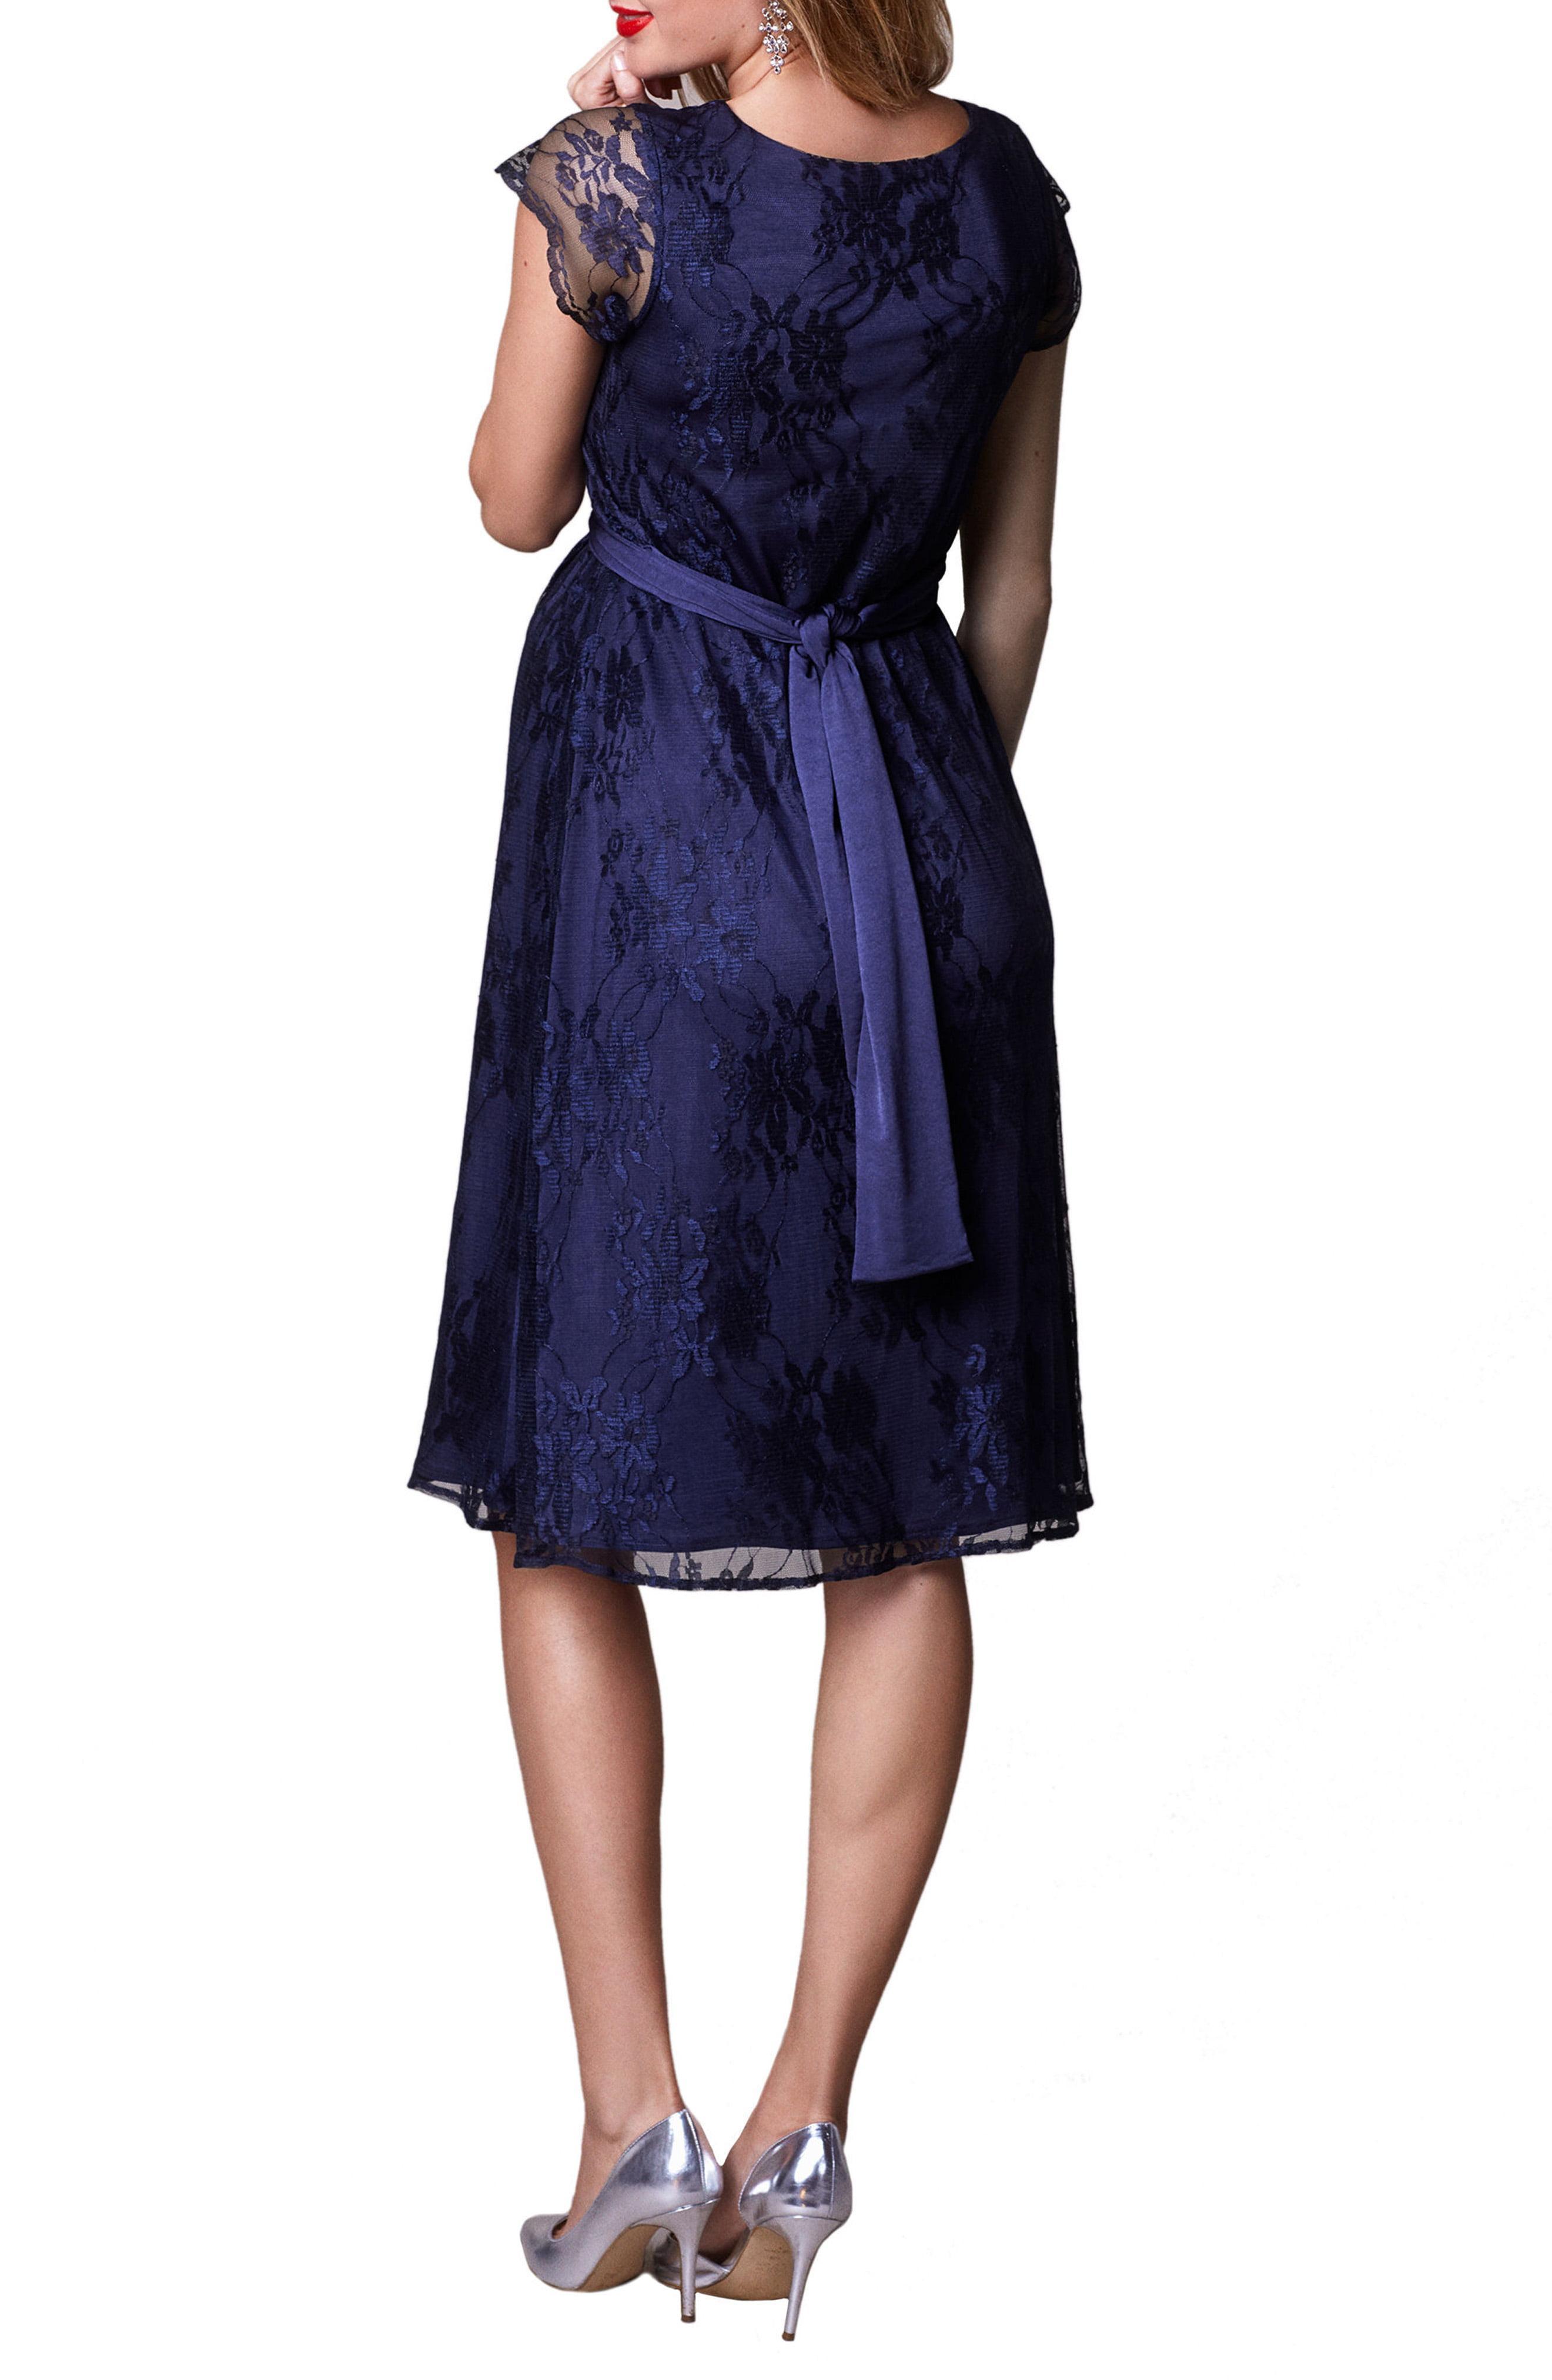 d3eb87de11 Lyst - TIFFANY ROSE April Maternity nursing Dress in Blue